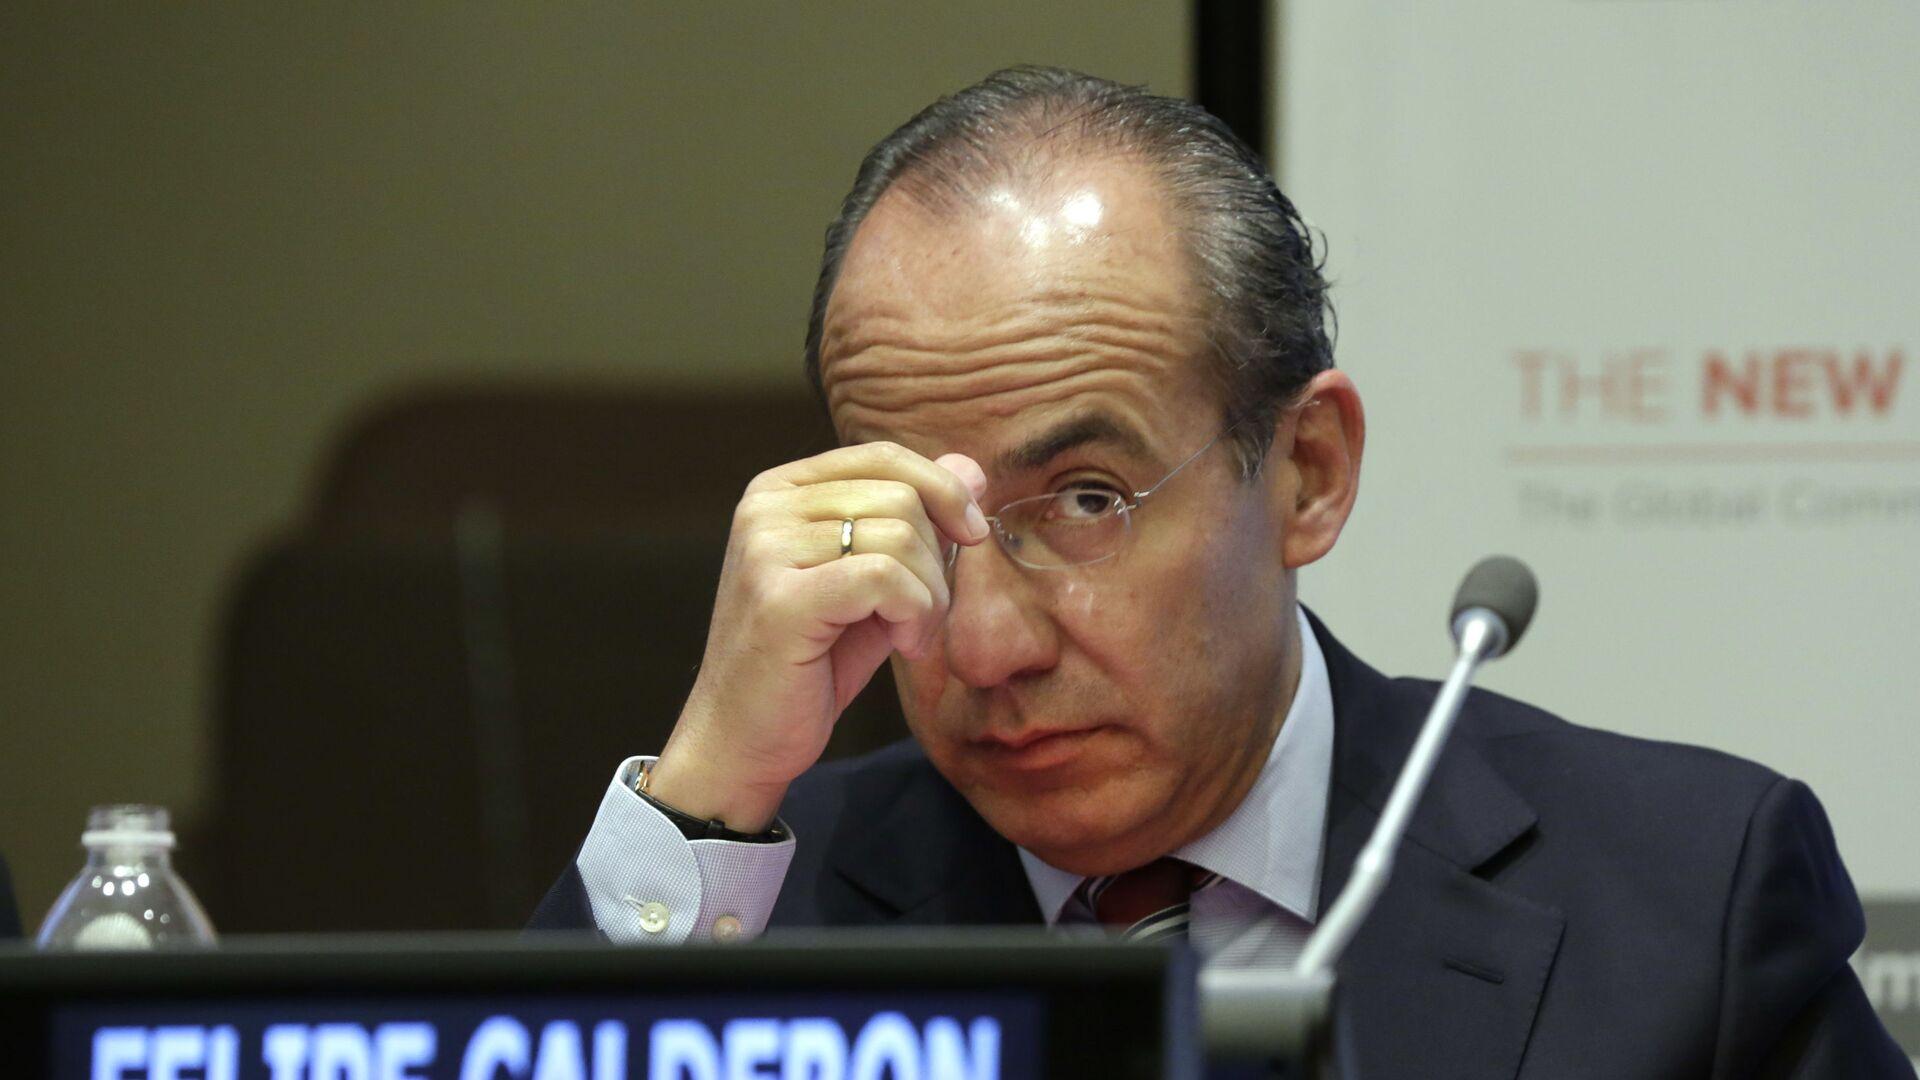 El expresidente de México Felipe Calderón - Sputnik Mundo, 1920, 21.09.2021